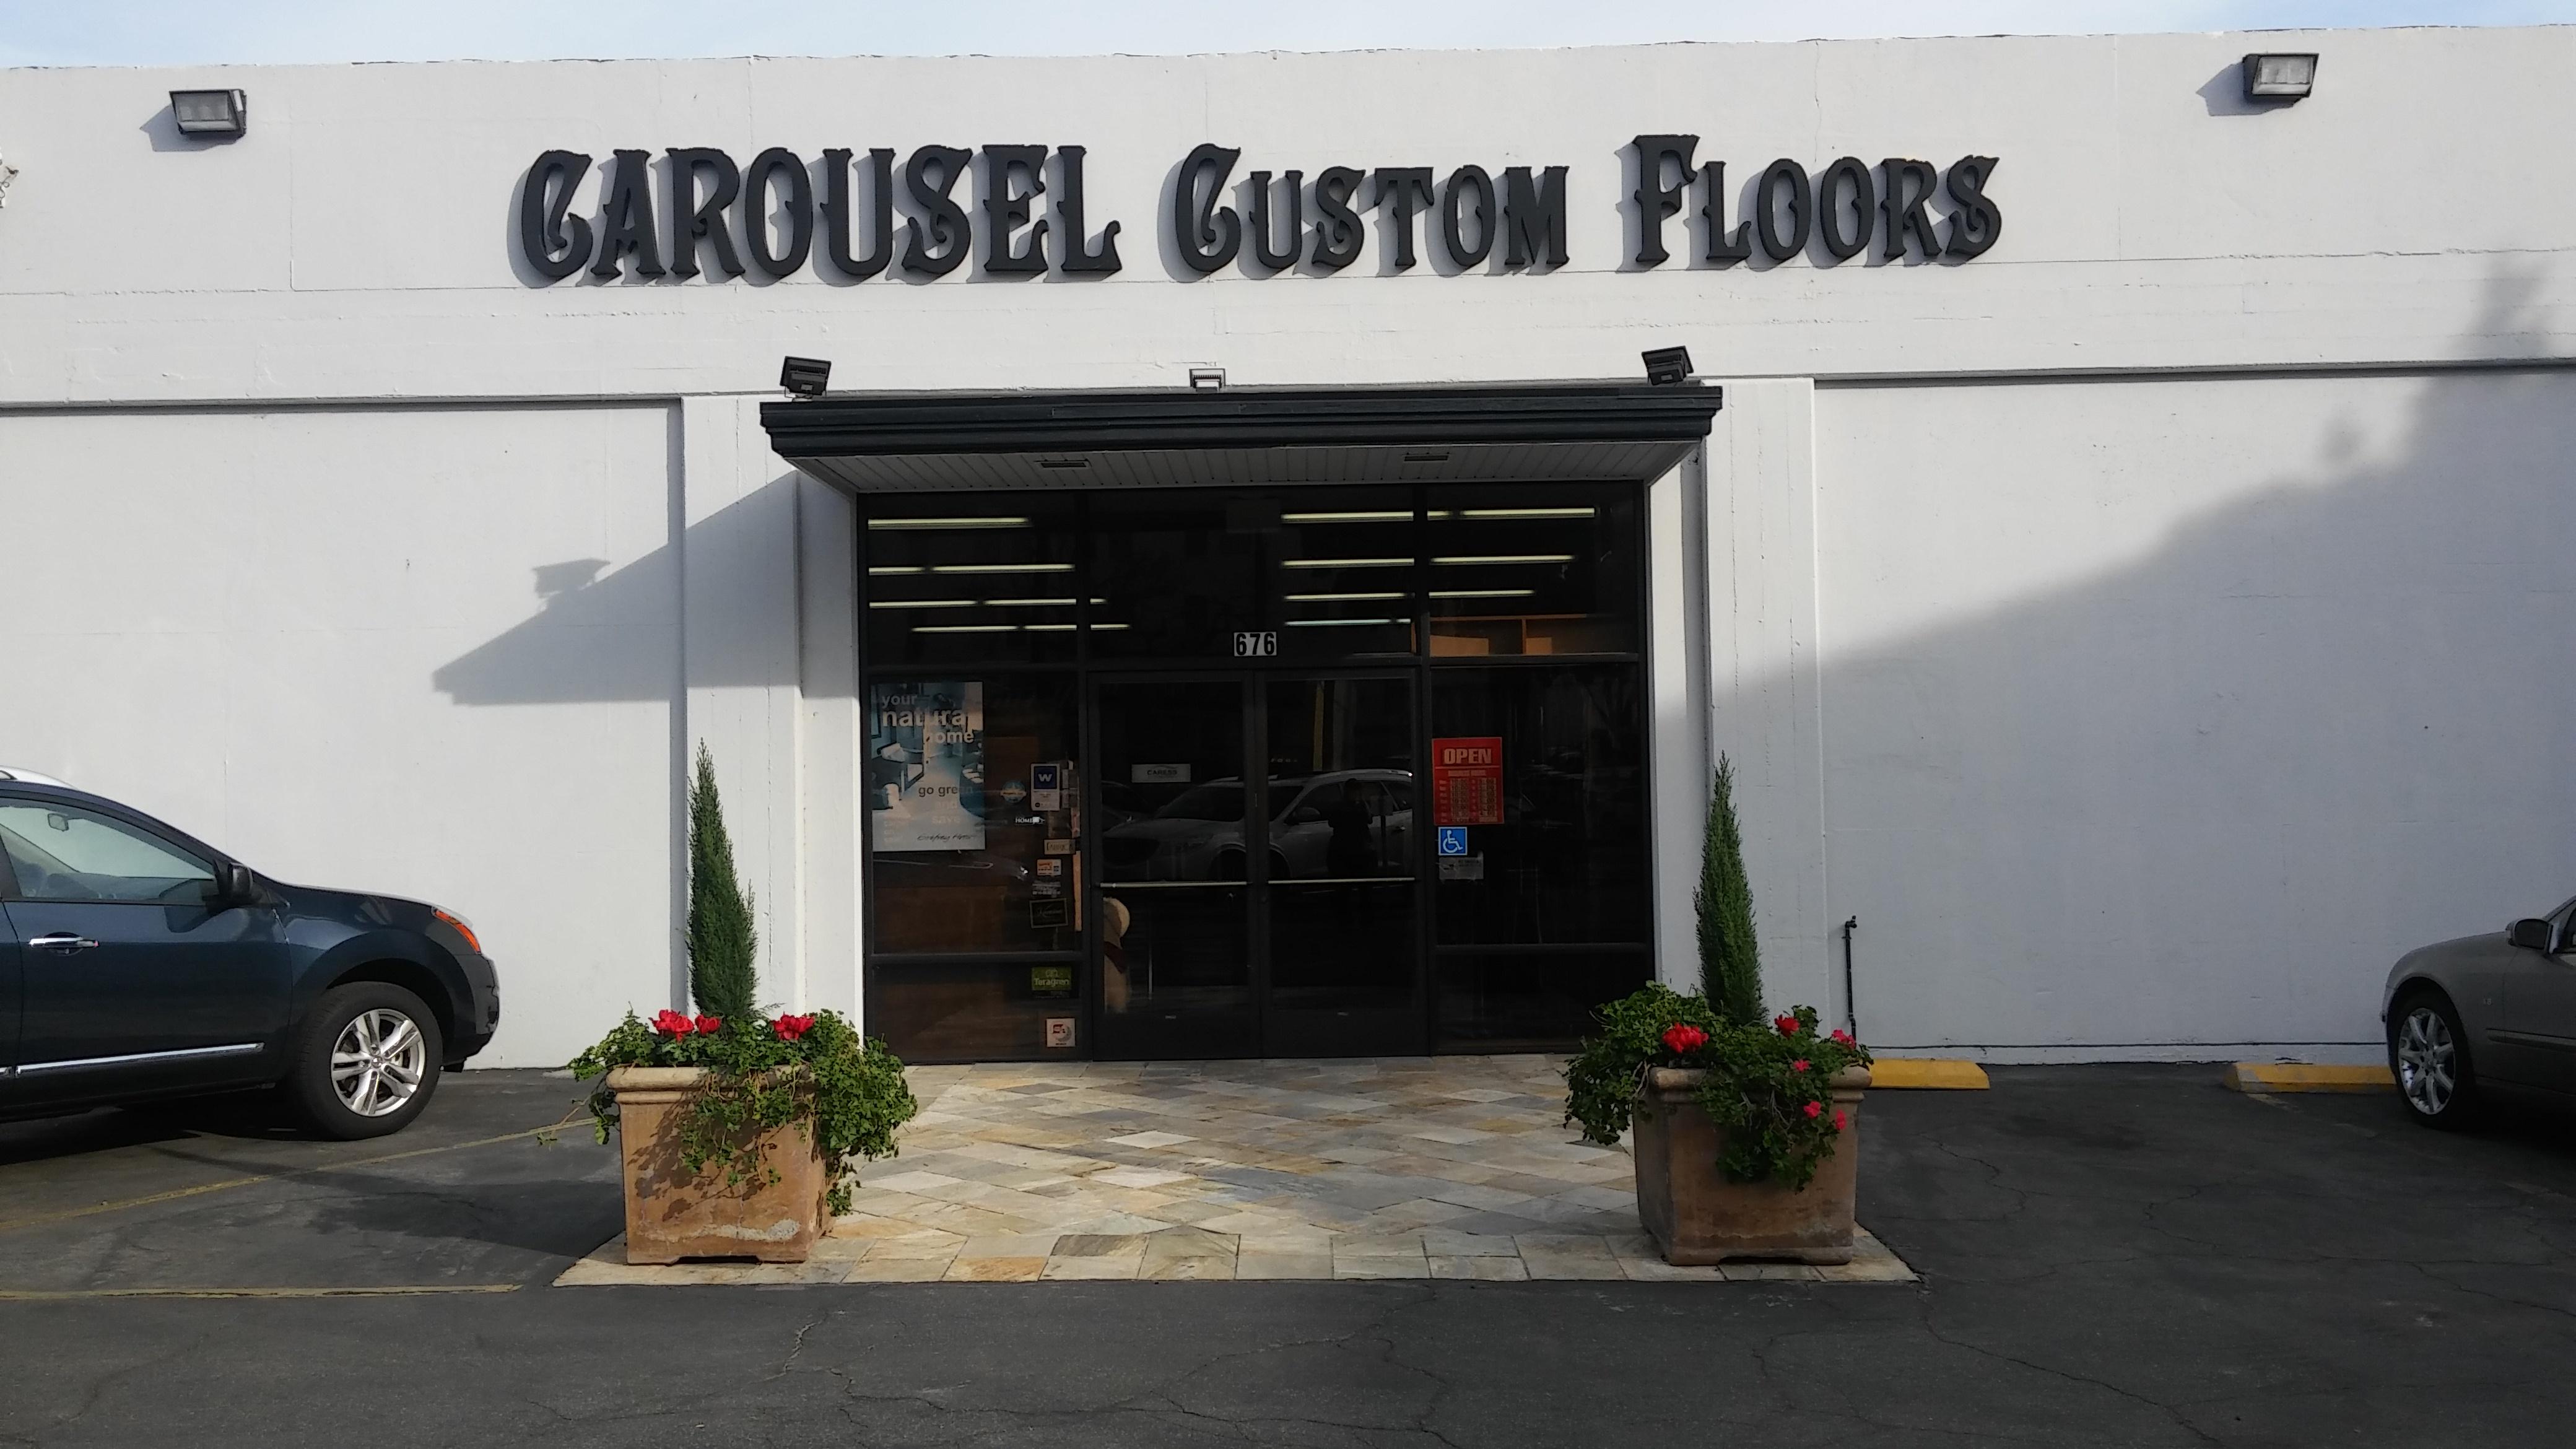 Carousel custom floors in pasadena ca 91101 for Pasadena floors